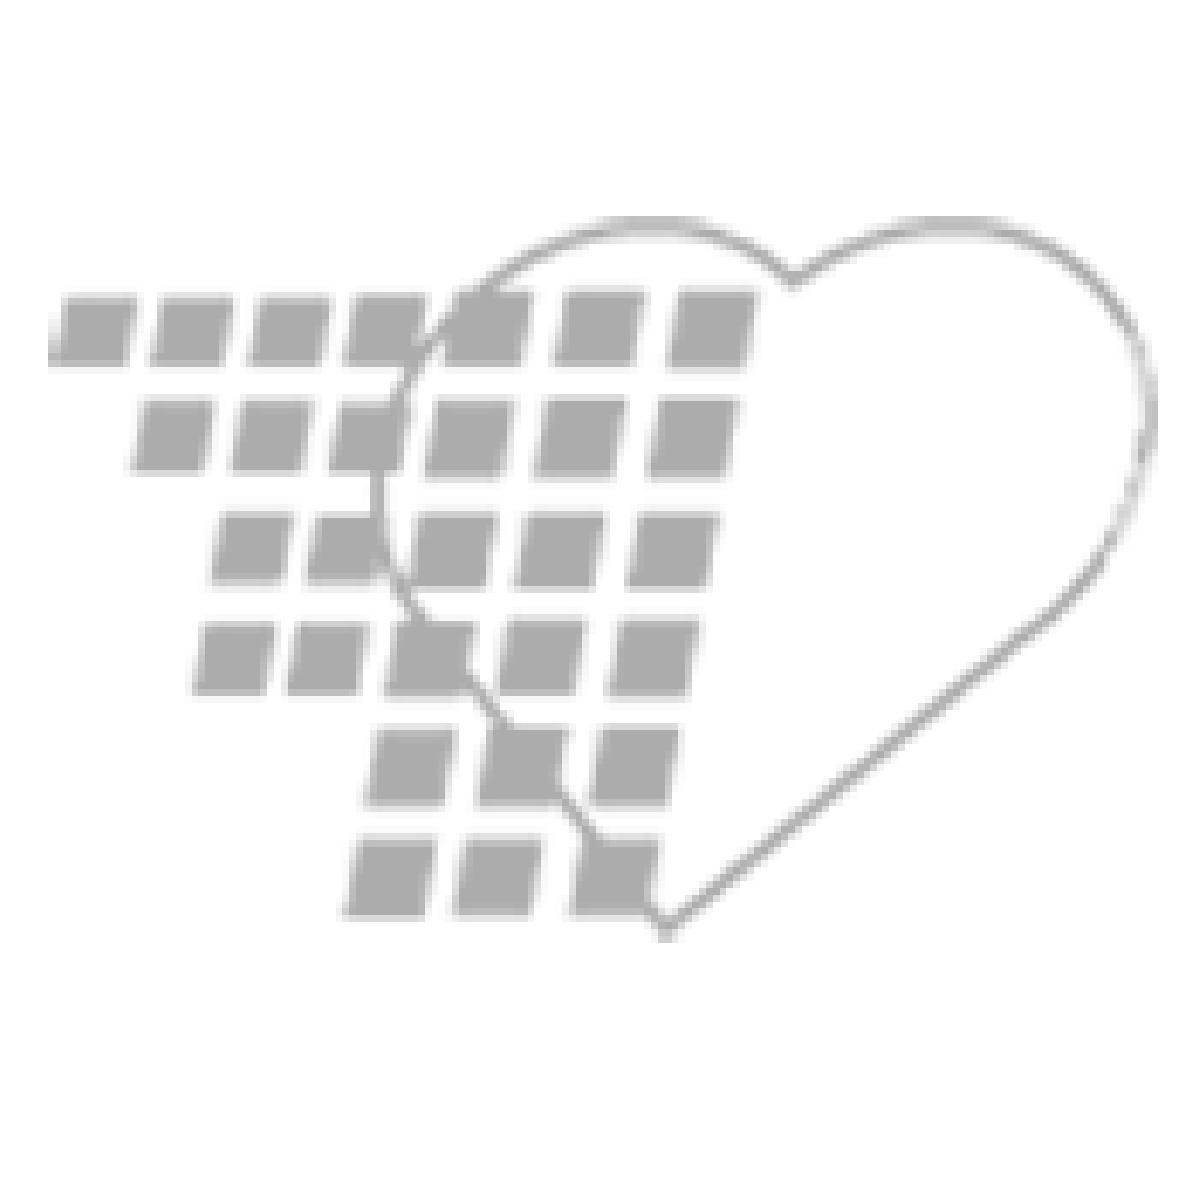 05-74-5523 Pocket Nurse® ID Bands